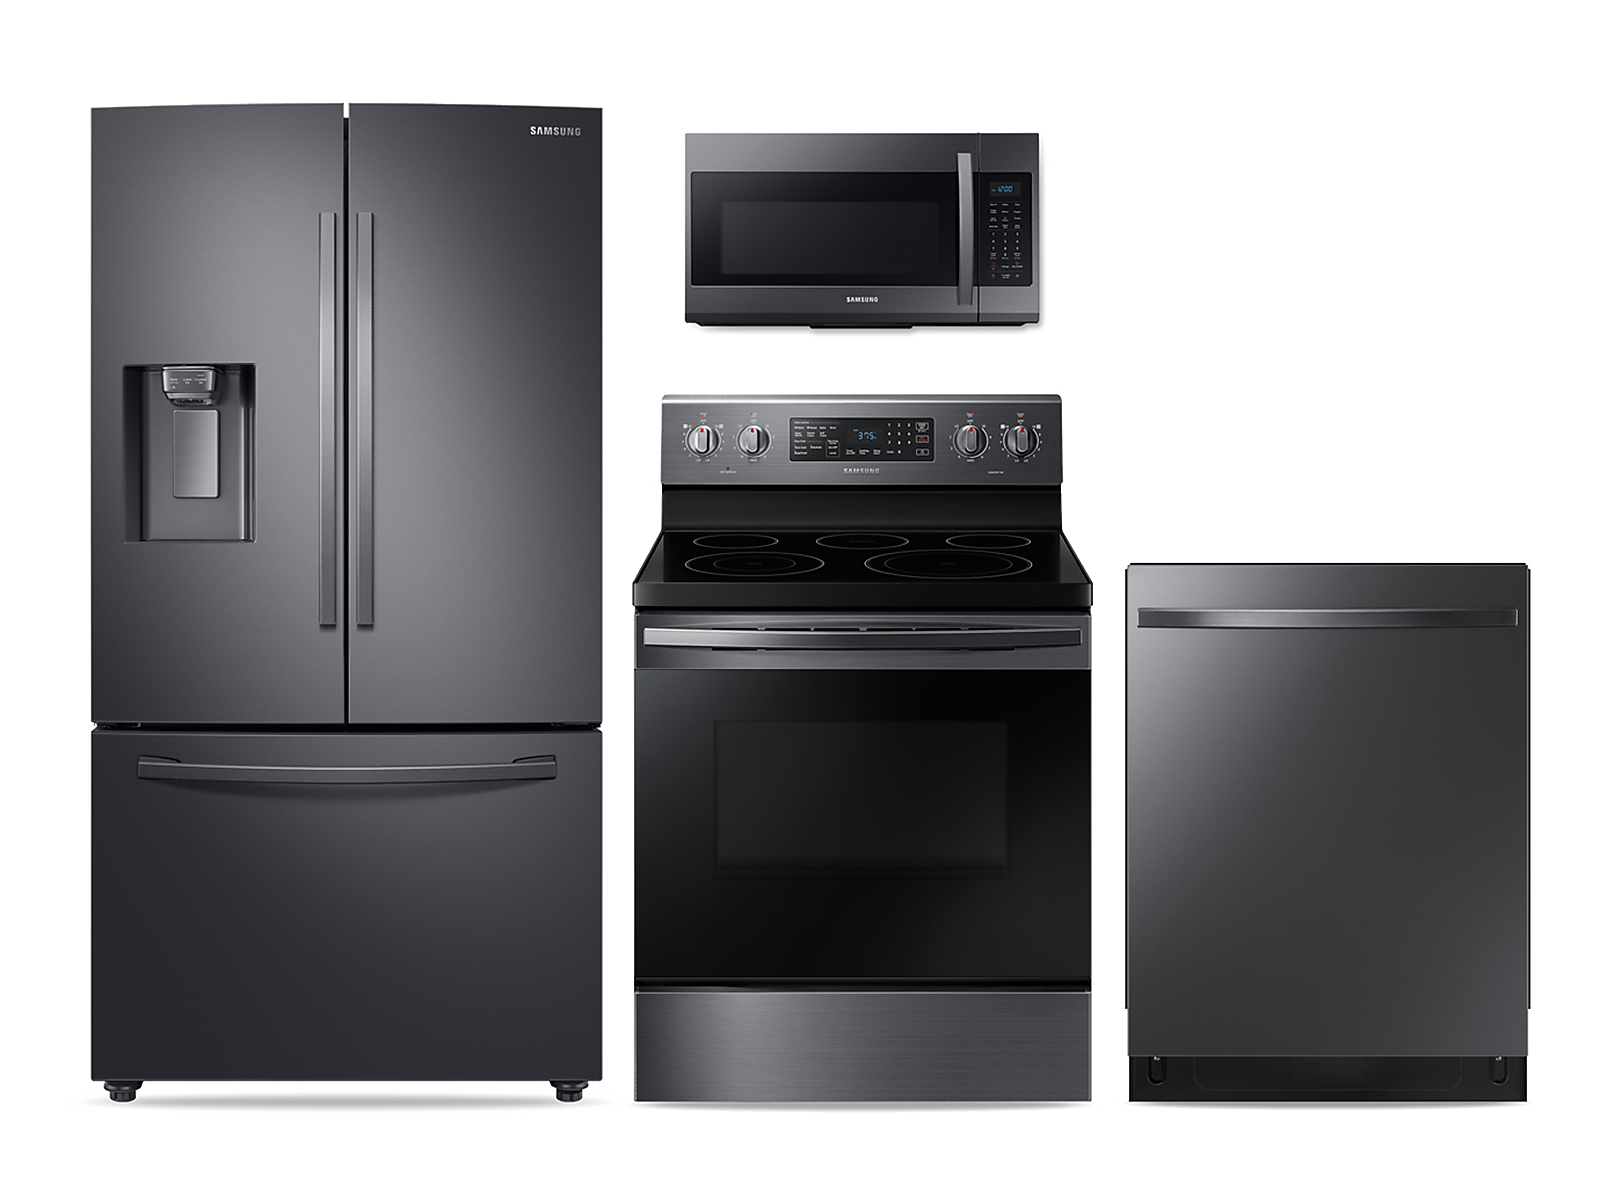 Samsung coupon: Samsung Large Capacity 3-door Refrigerator + Electric Range + StormWash Dishwasher + Microwave Kitchen Package in Black Stainless(BNDL-1572441962958)